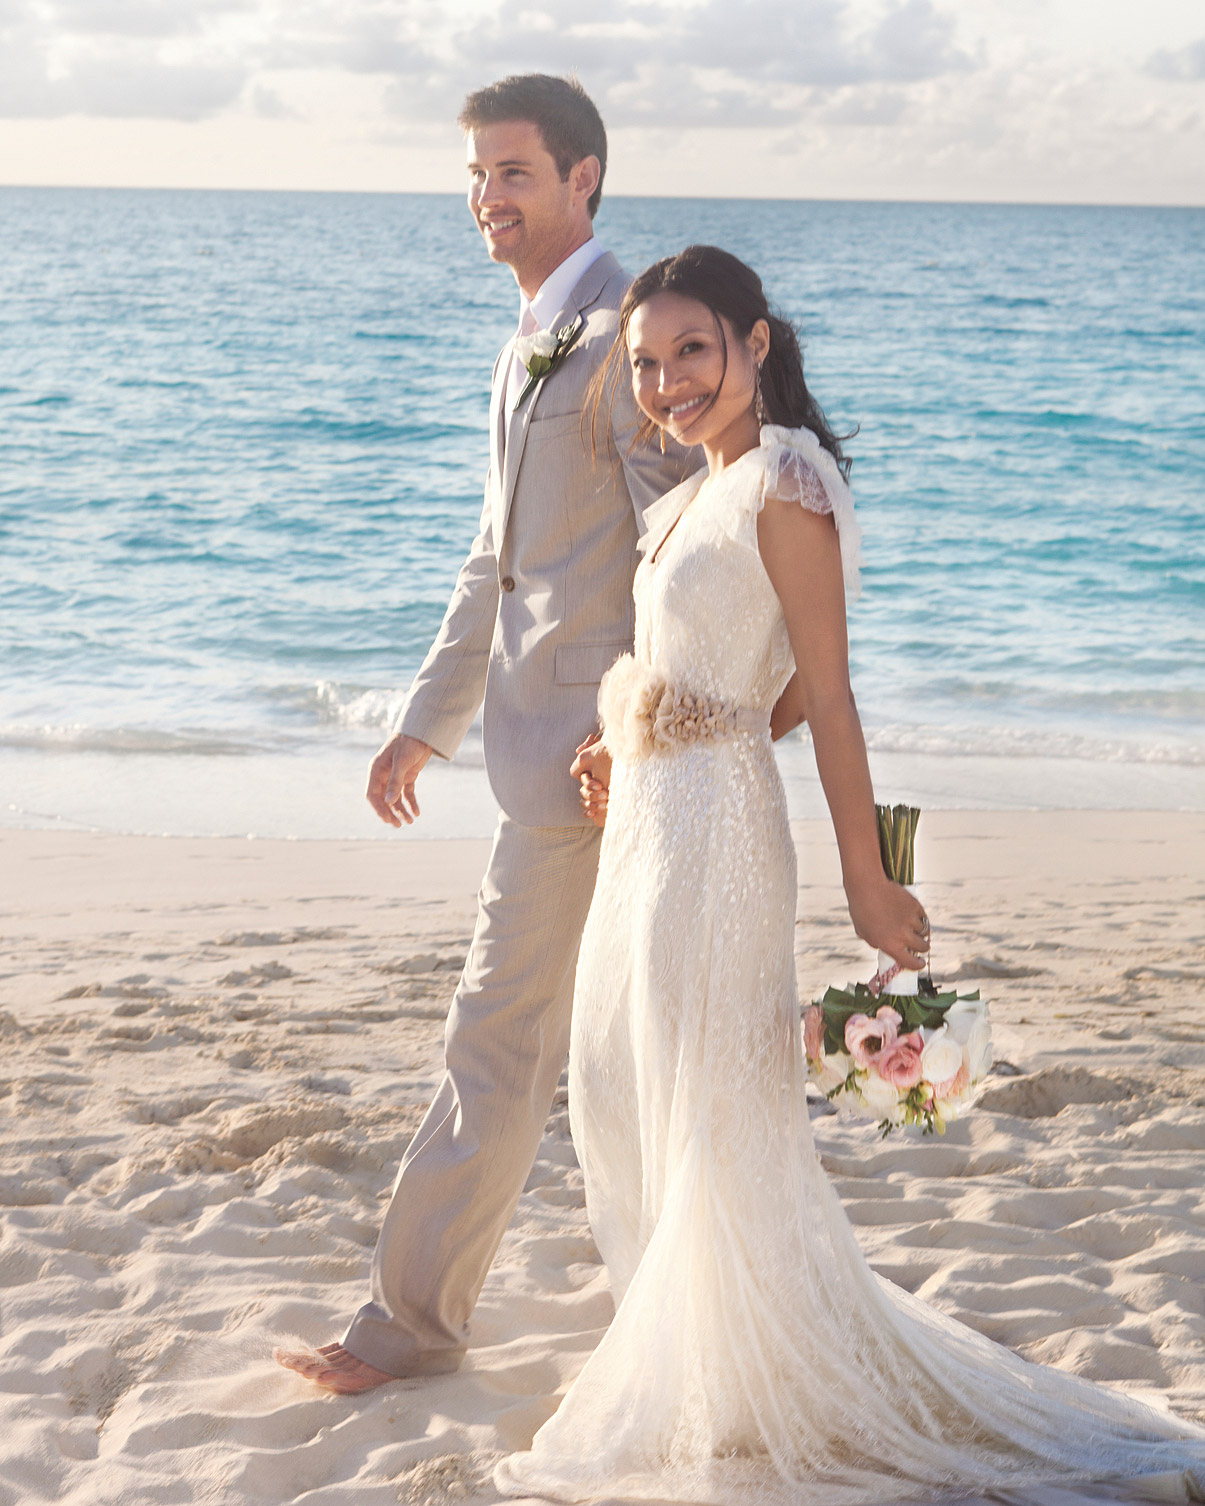 rw-anne-josh-bride-groom-mwd106057.jpg